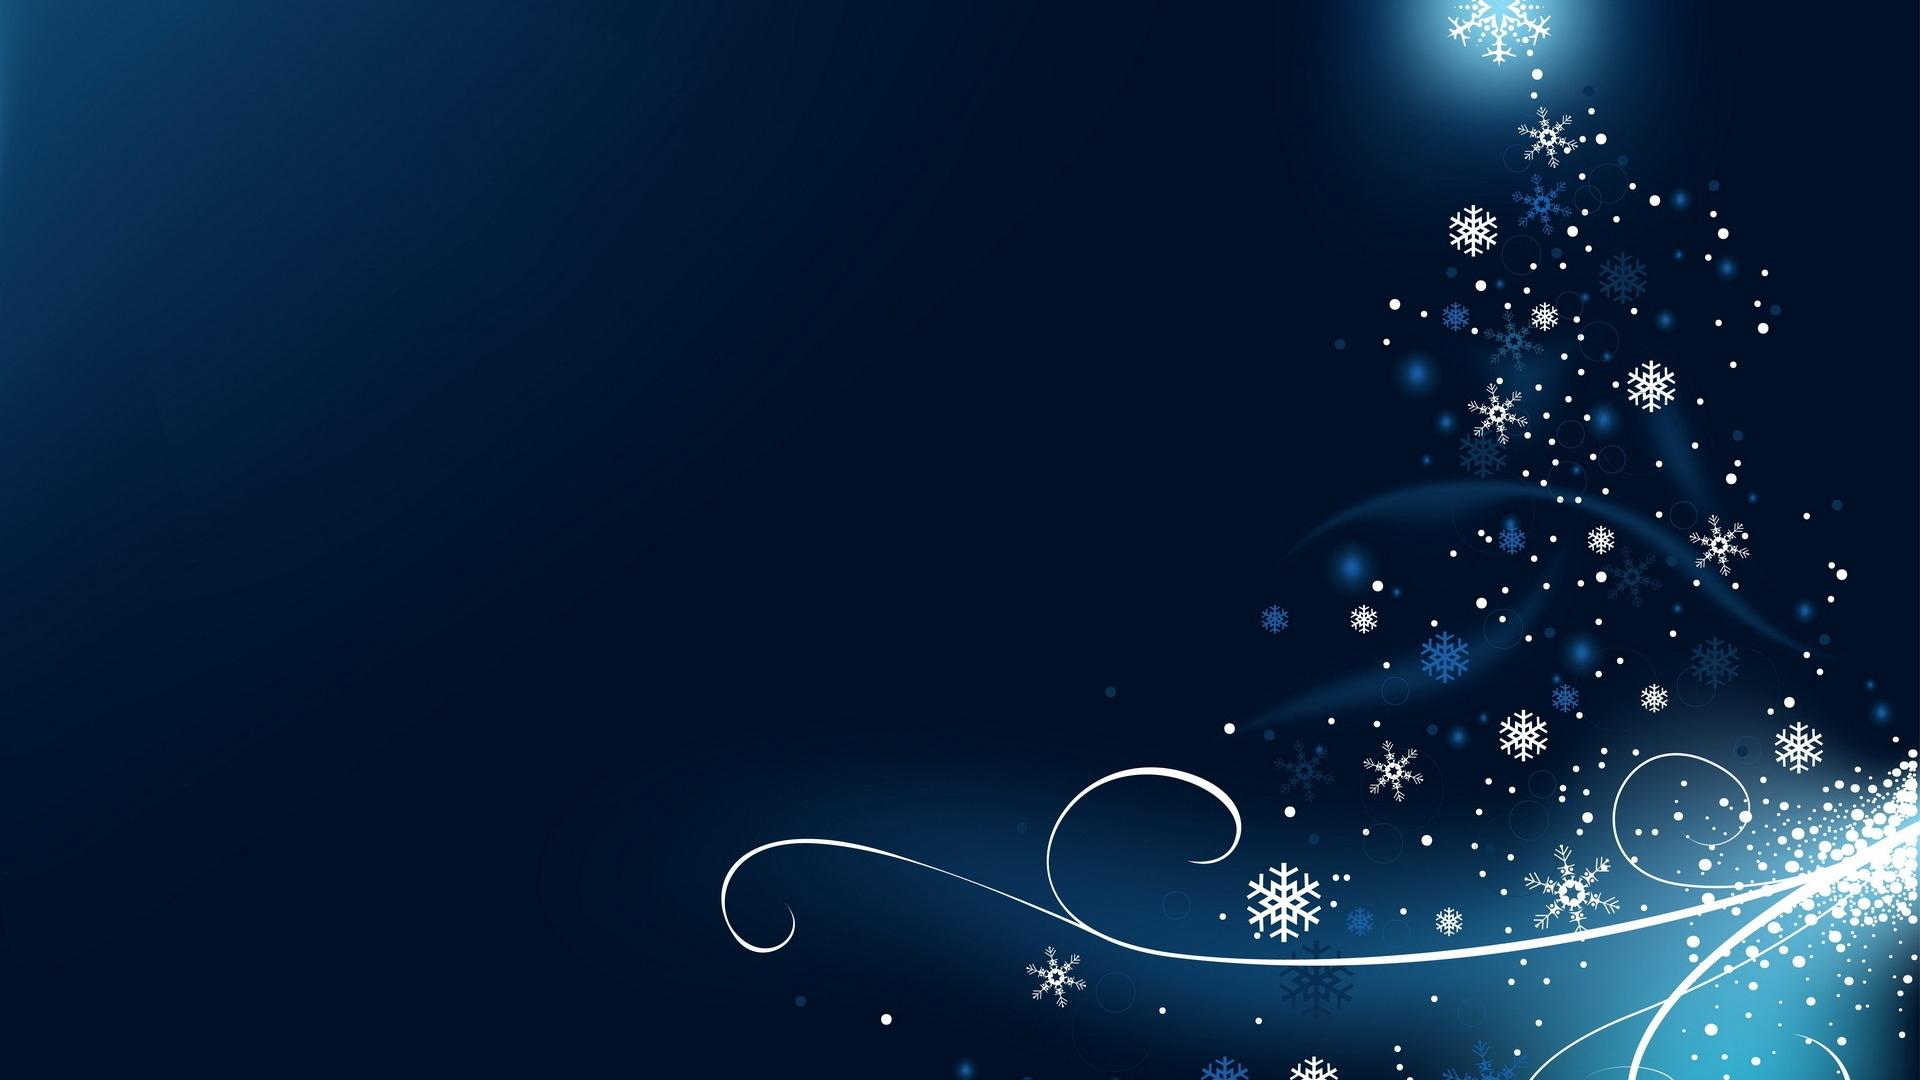 Google themes for pc - Google Chrome Themes Christmas Snowflake Theme